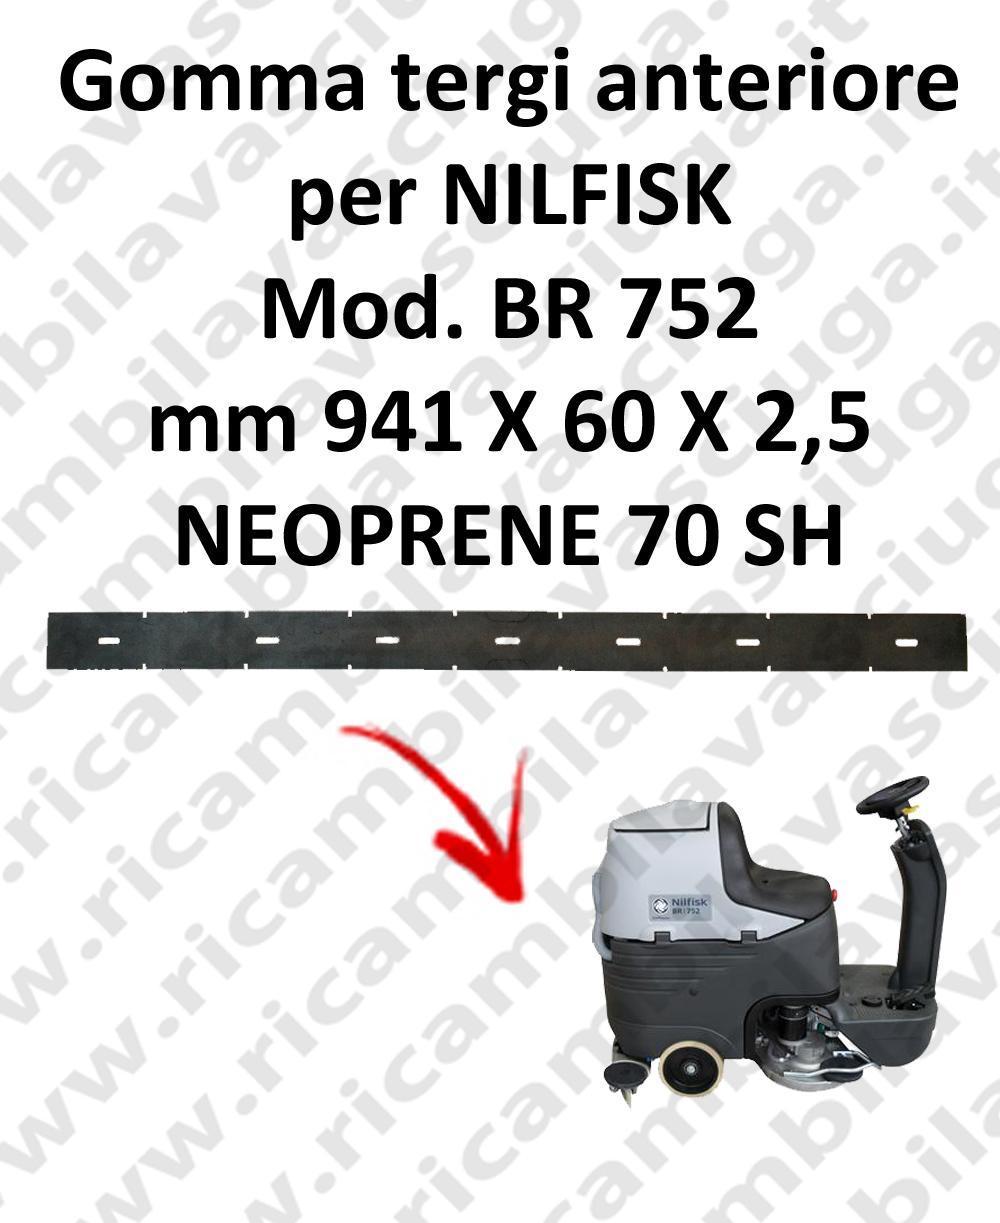 goma de secado delantera para fregadora NILFISK Model BR 752